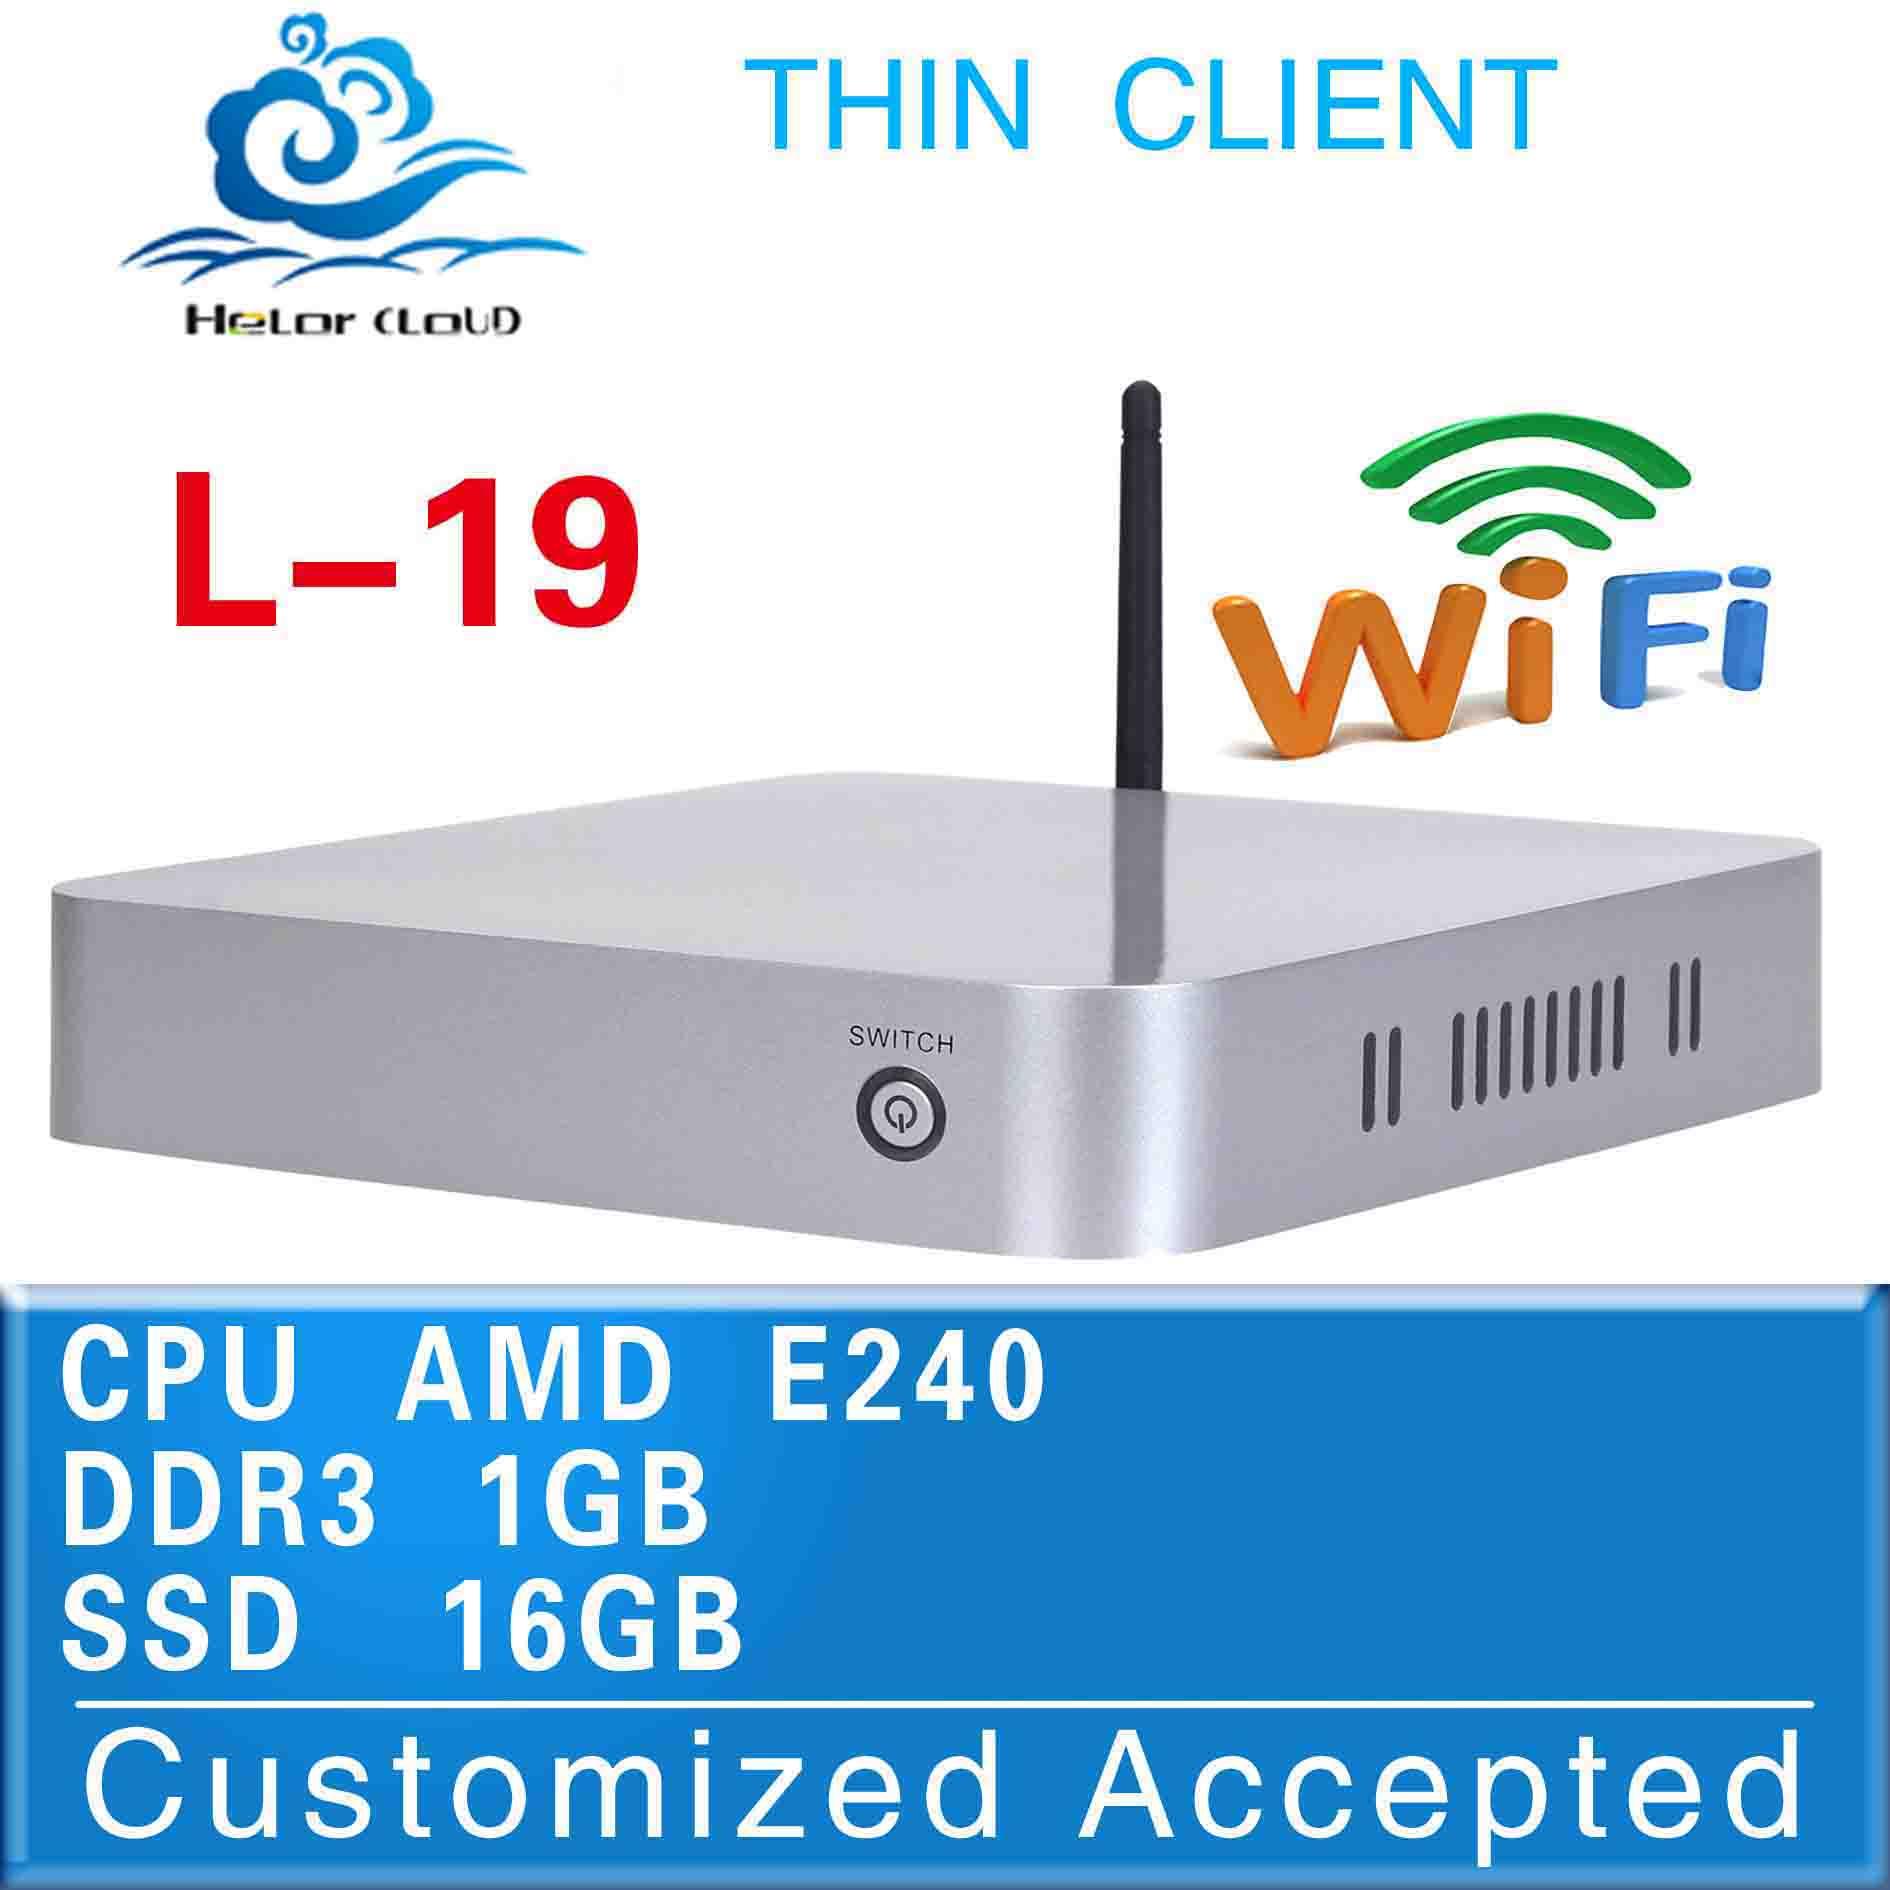 Hot sales! thin client mini pc htpc Pc host L19 E240 CPU 1GB RAM 16GB SSD AMD Hudson D1 4*USB2.0,1*HDMI 1.3,1*VGA,1*MIC,1*SPK(China (Mainland))